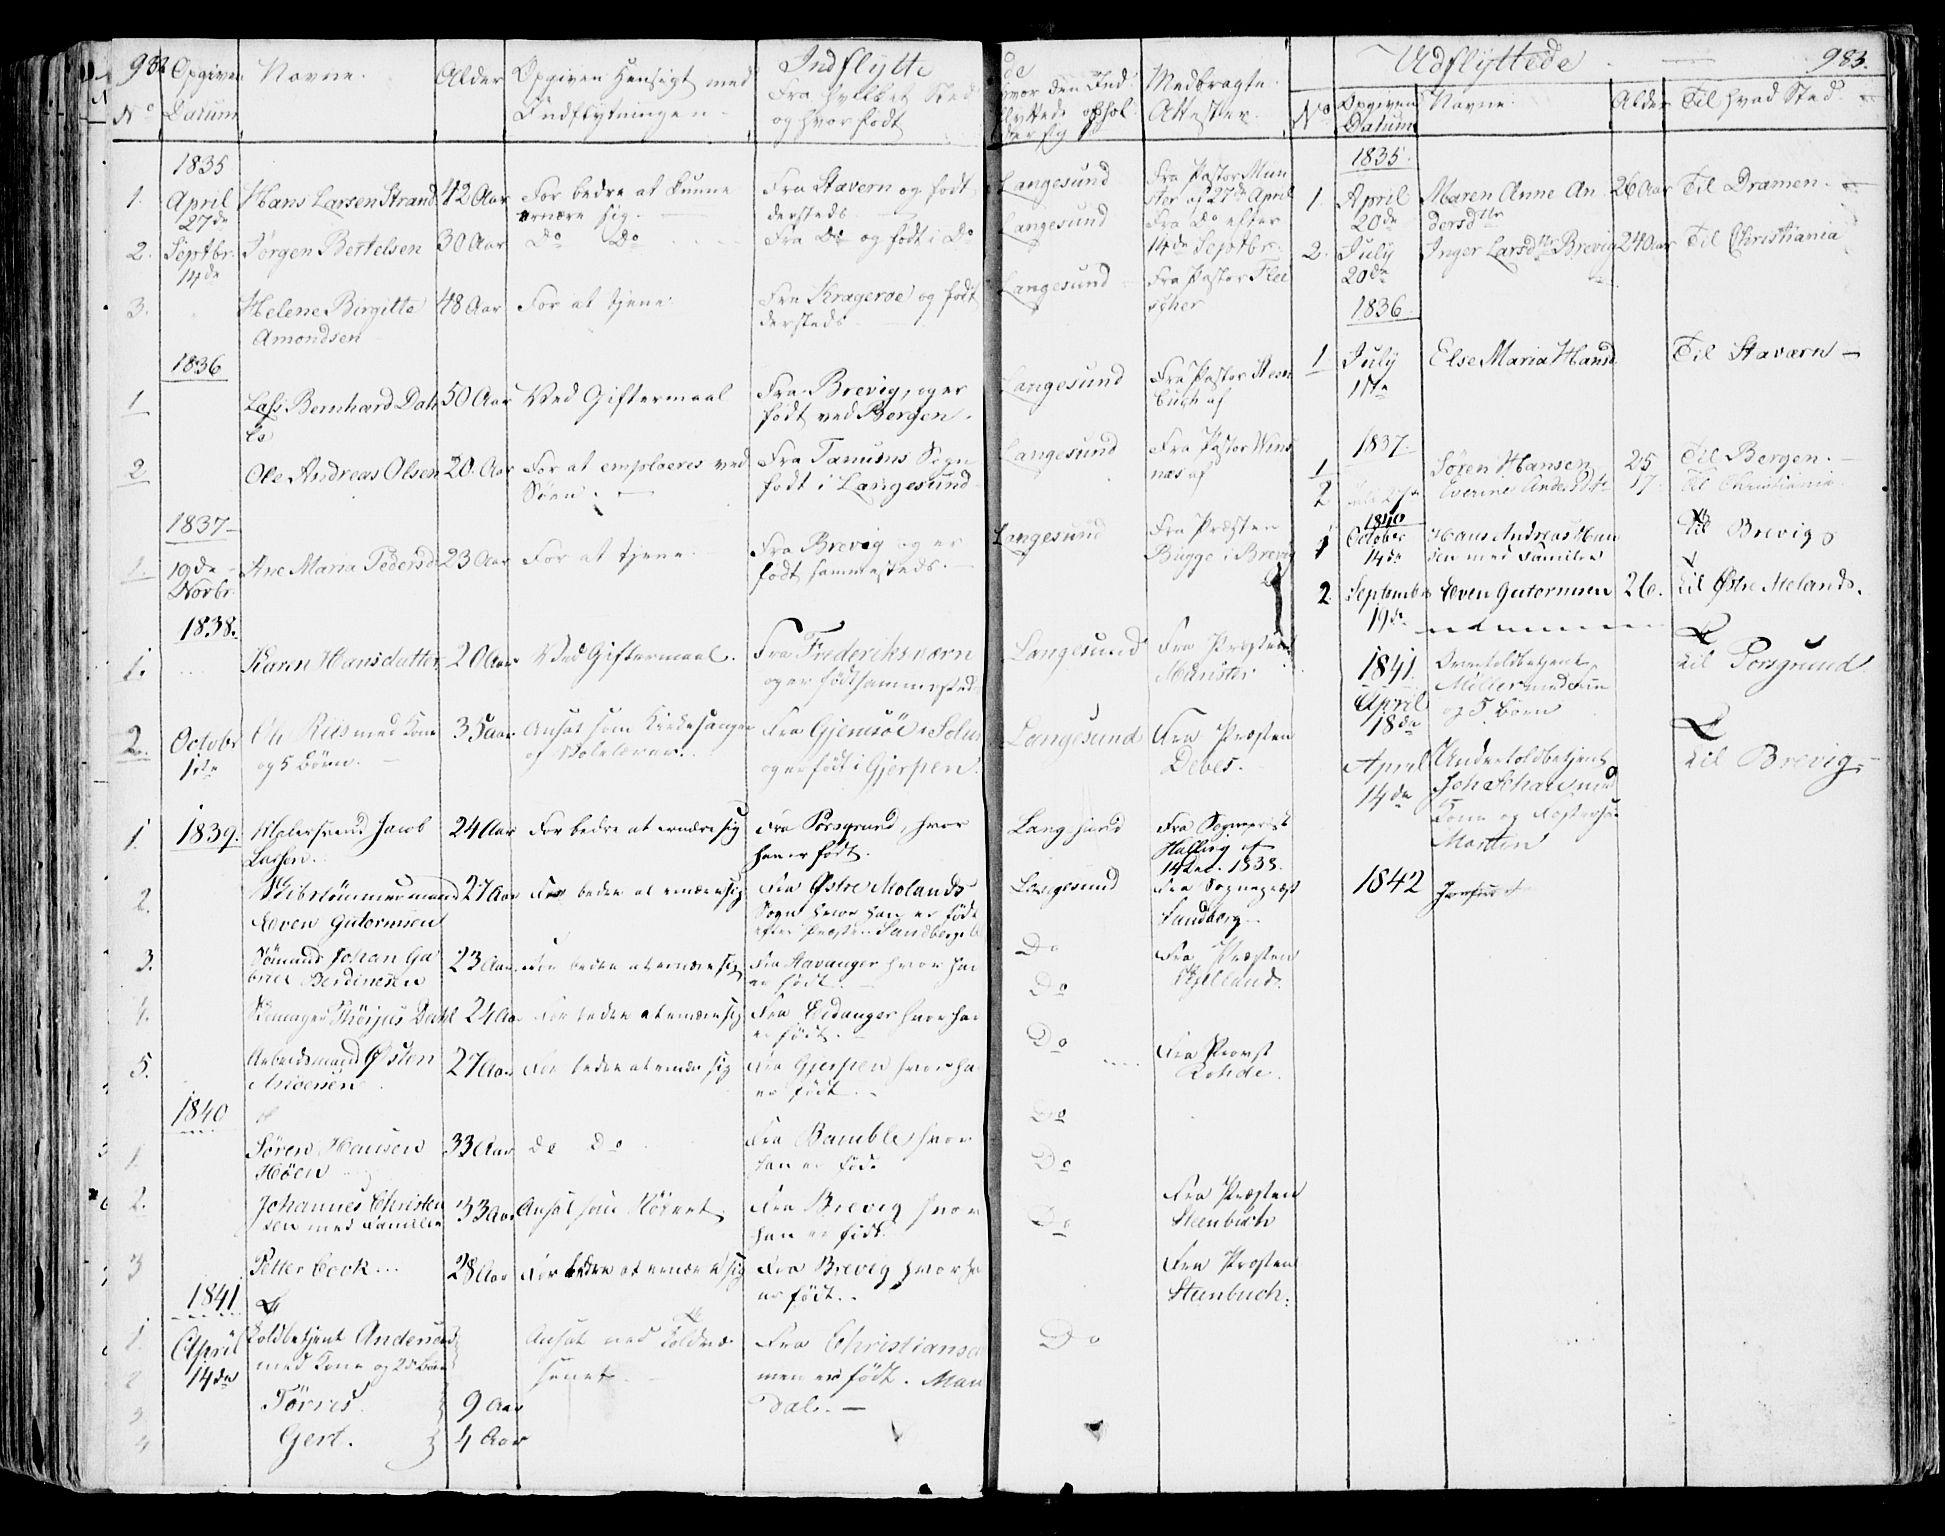 SAKO, Bamble kirkebøker, F/Fa/L0004: Ministerialbok nr. I 4, 1834-1853, s. 982-983